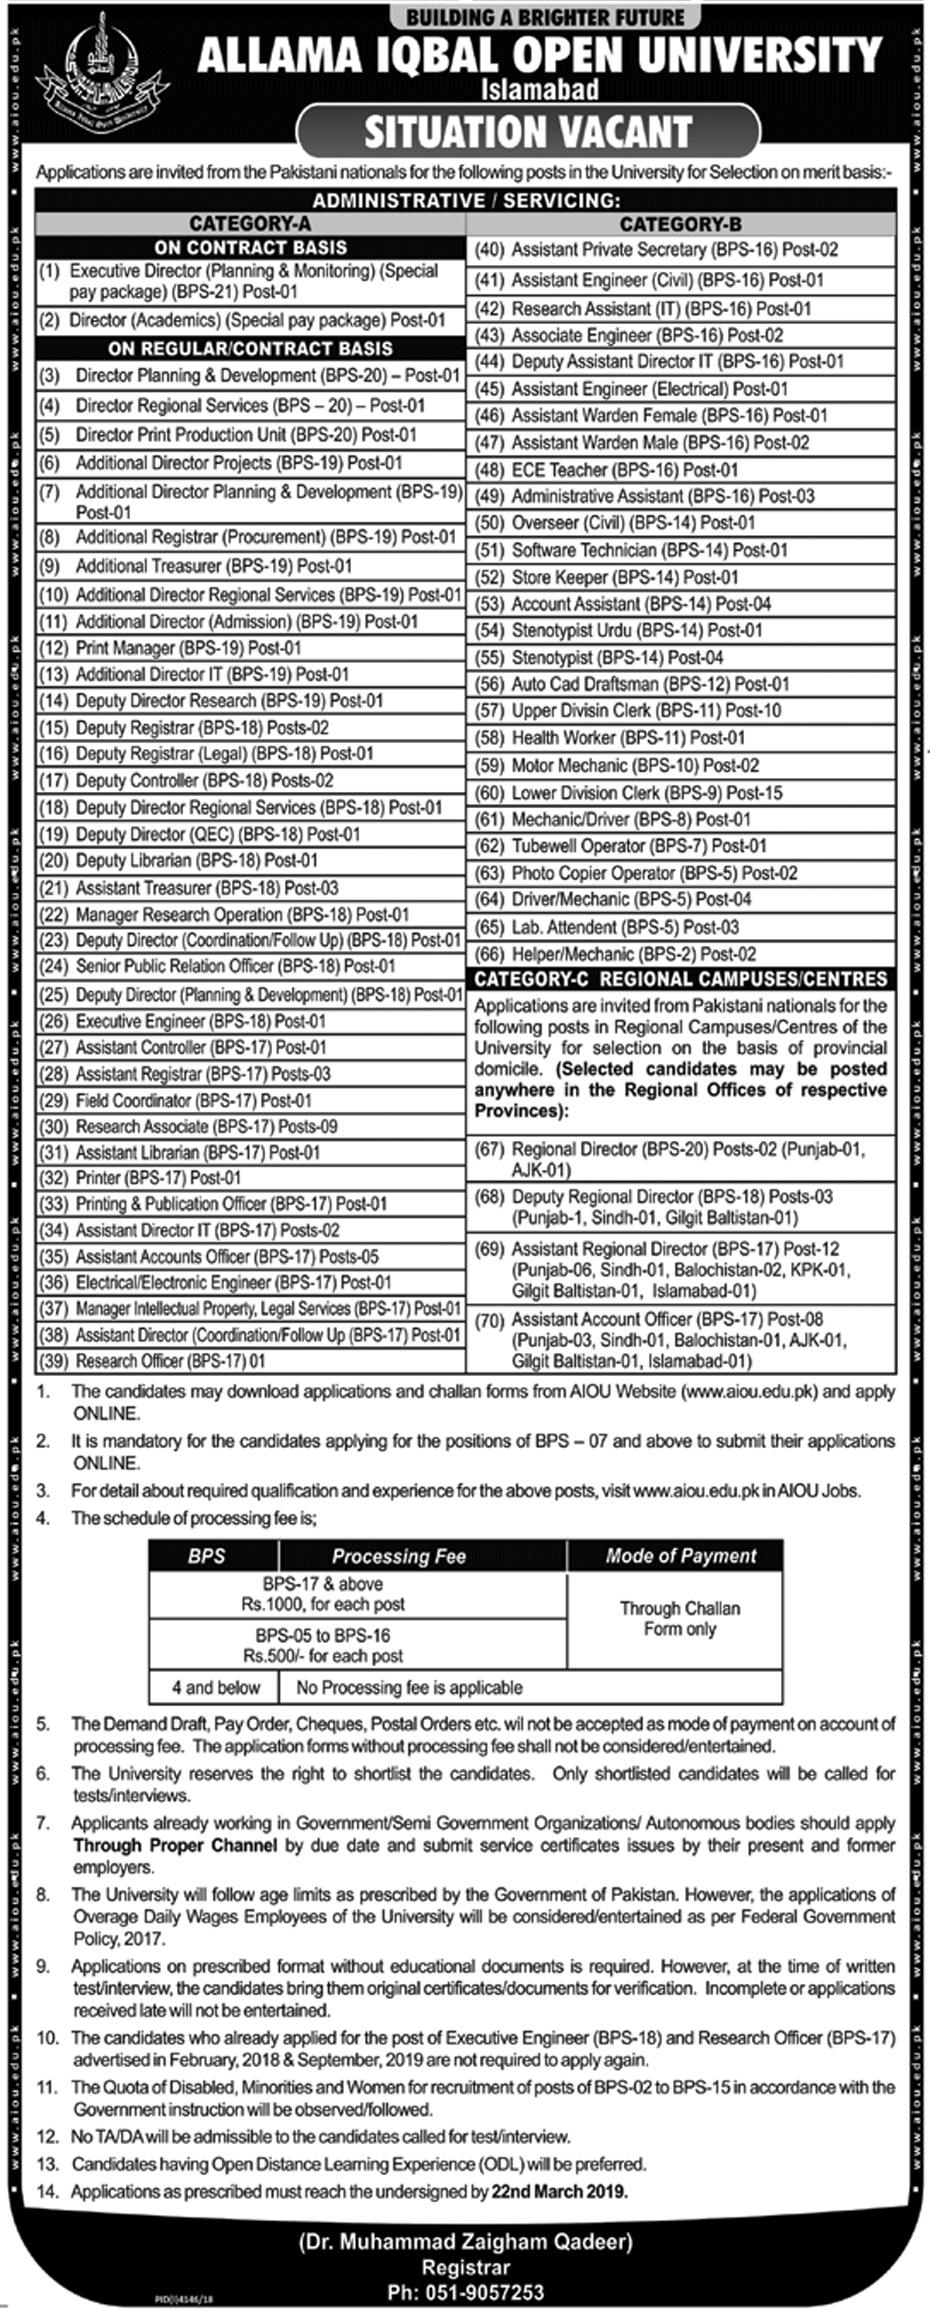 AIOU Jobs 2019 Advertisement, Application Form, Challan Form